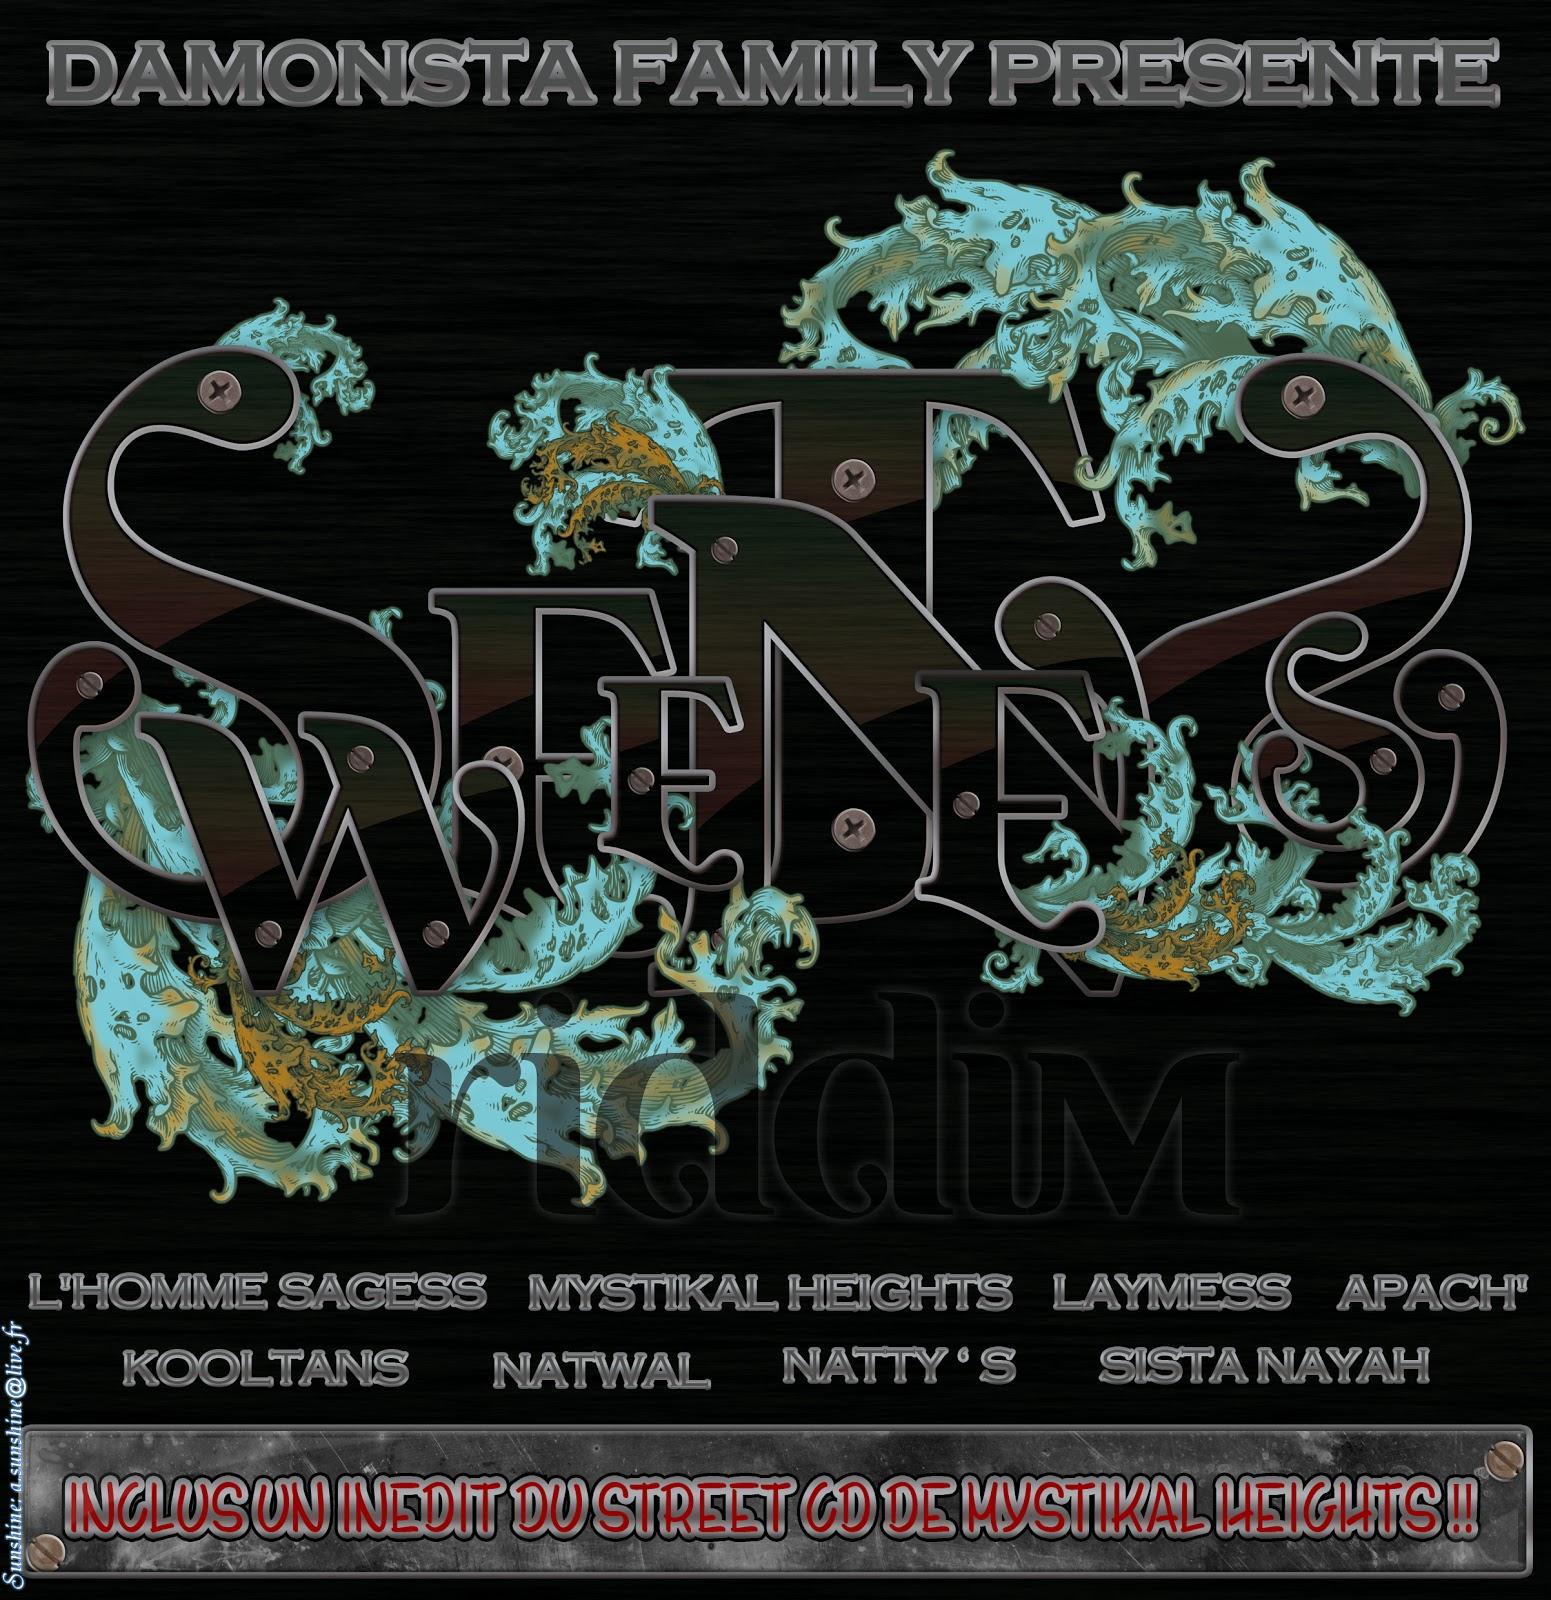 LinkUp Di CD MIX Vibes : Sweetness Riddim {Da Monsta Family